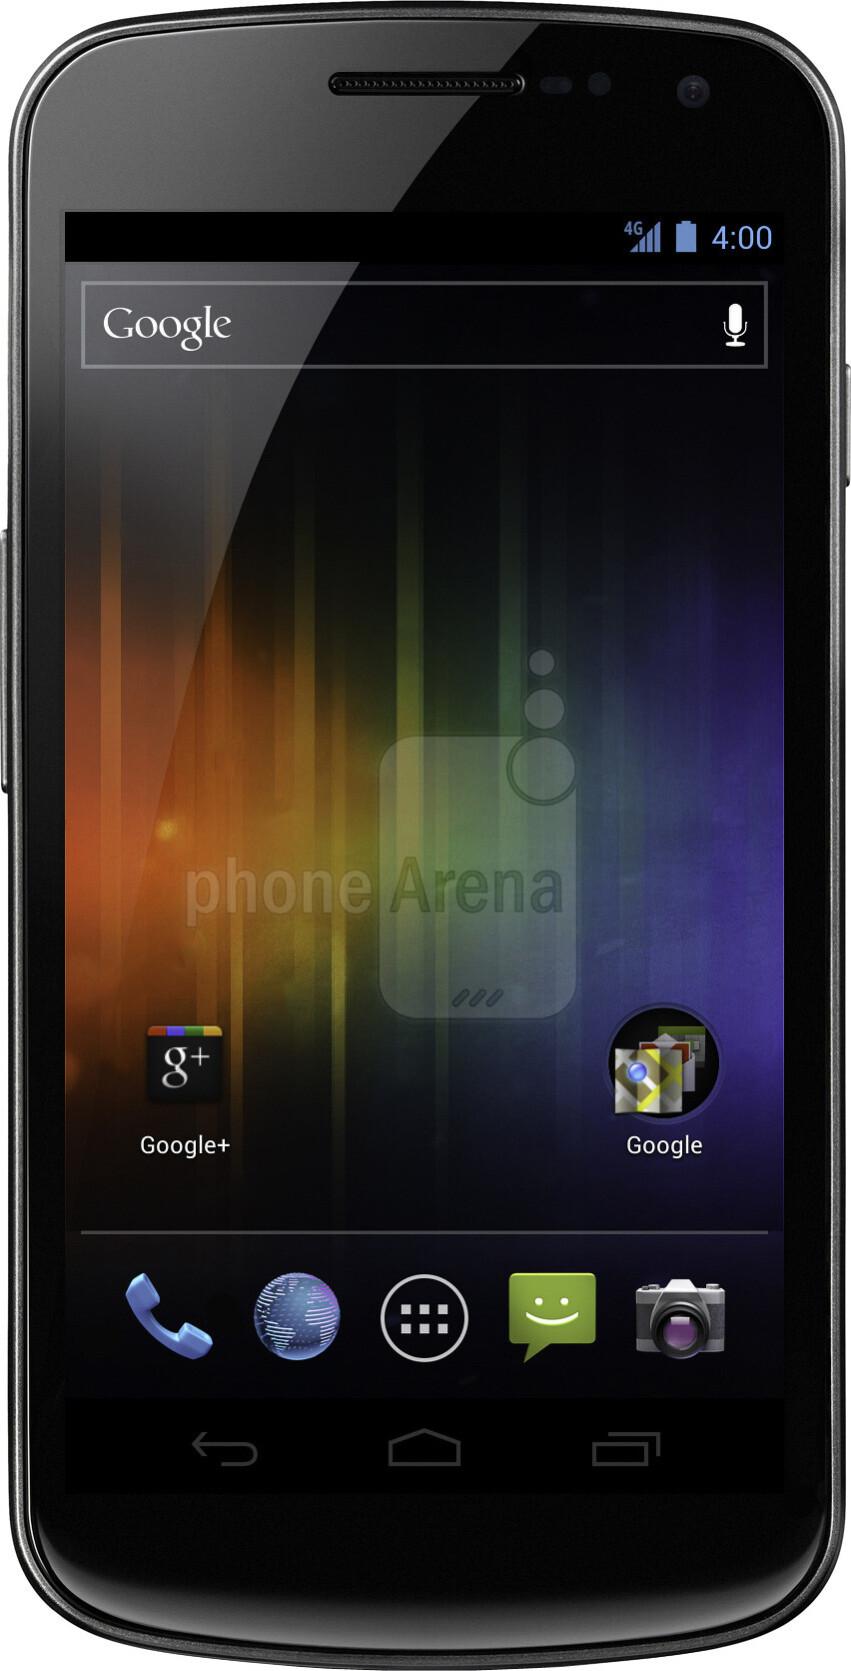 Samsung GALAXY Nexus Size - Real life visualization and comparison